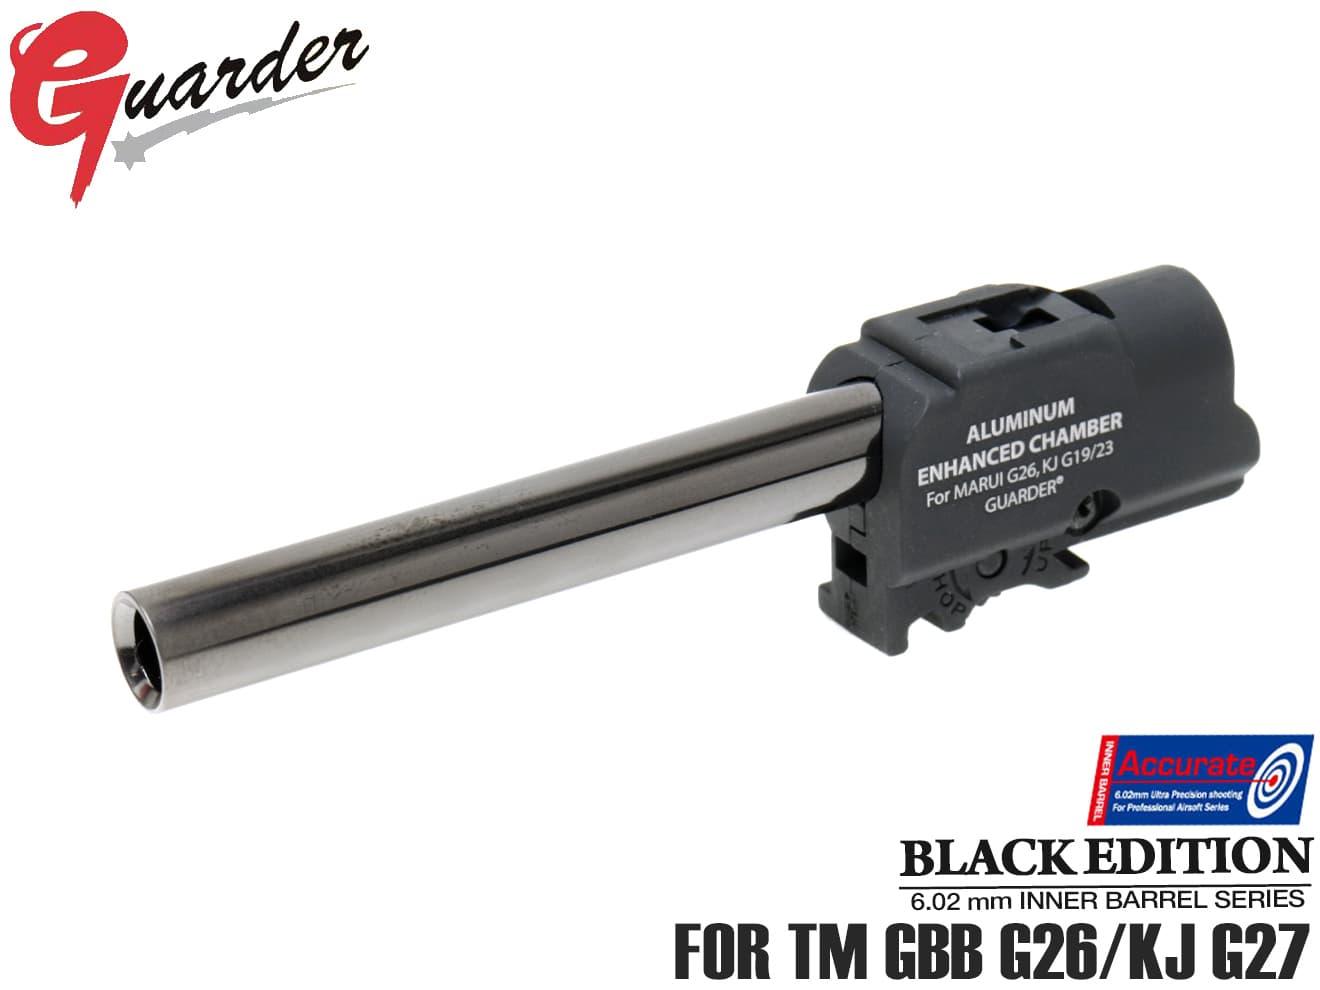 GLK-143■GUARDER 強化ホップアップチャンバー w/ 6.02 TNバレル マルイ G26/ KJ G27◆専用設計 ホップ強化 長掛け インナーバレル付 ドレスアップも